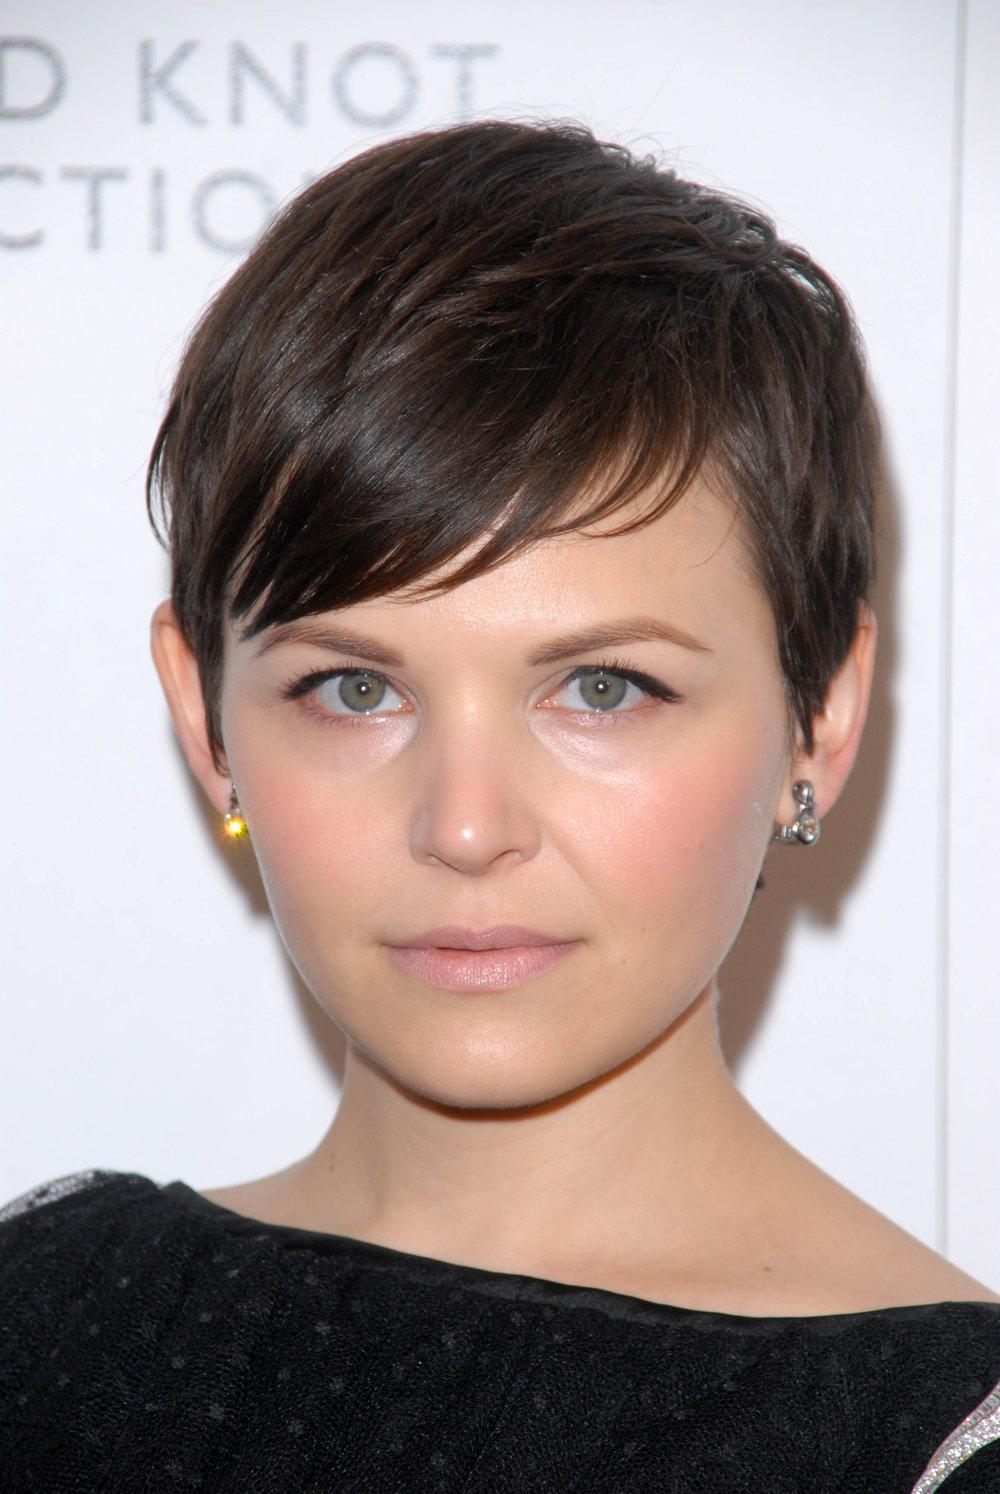 haircuts-round-faces-ginnifer-goodwin.jpg